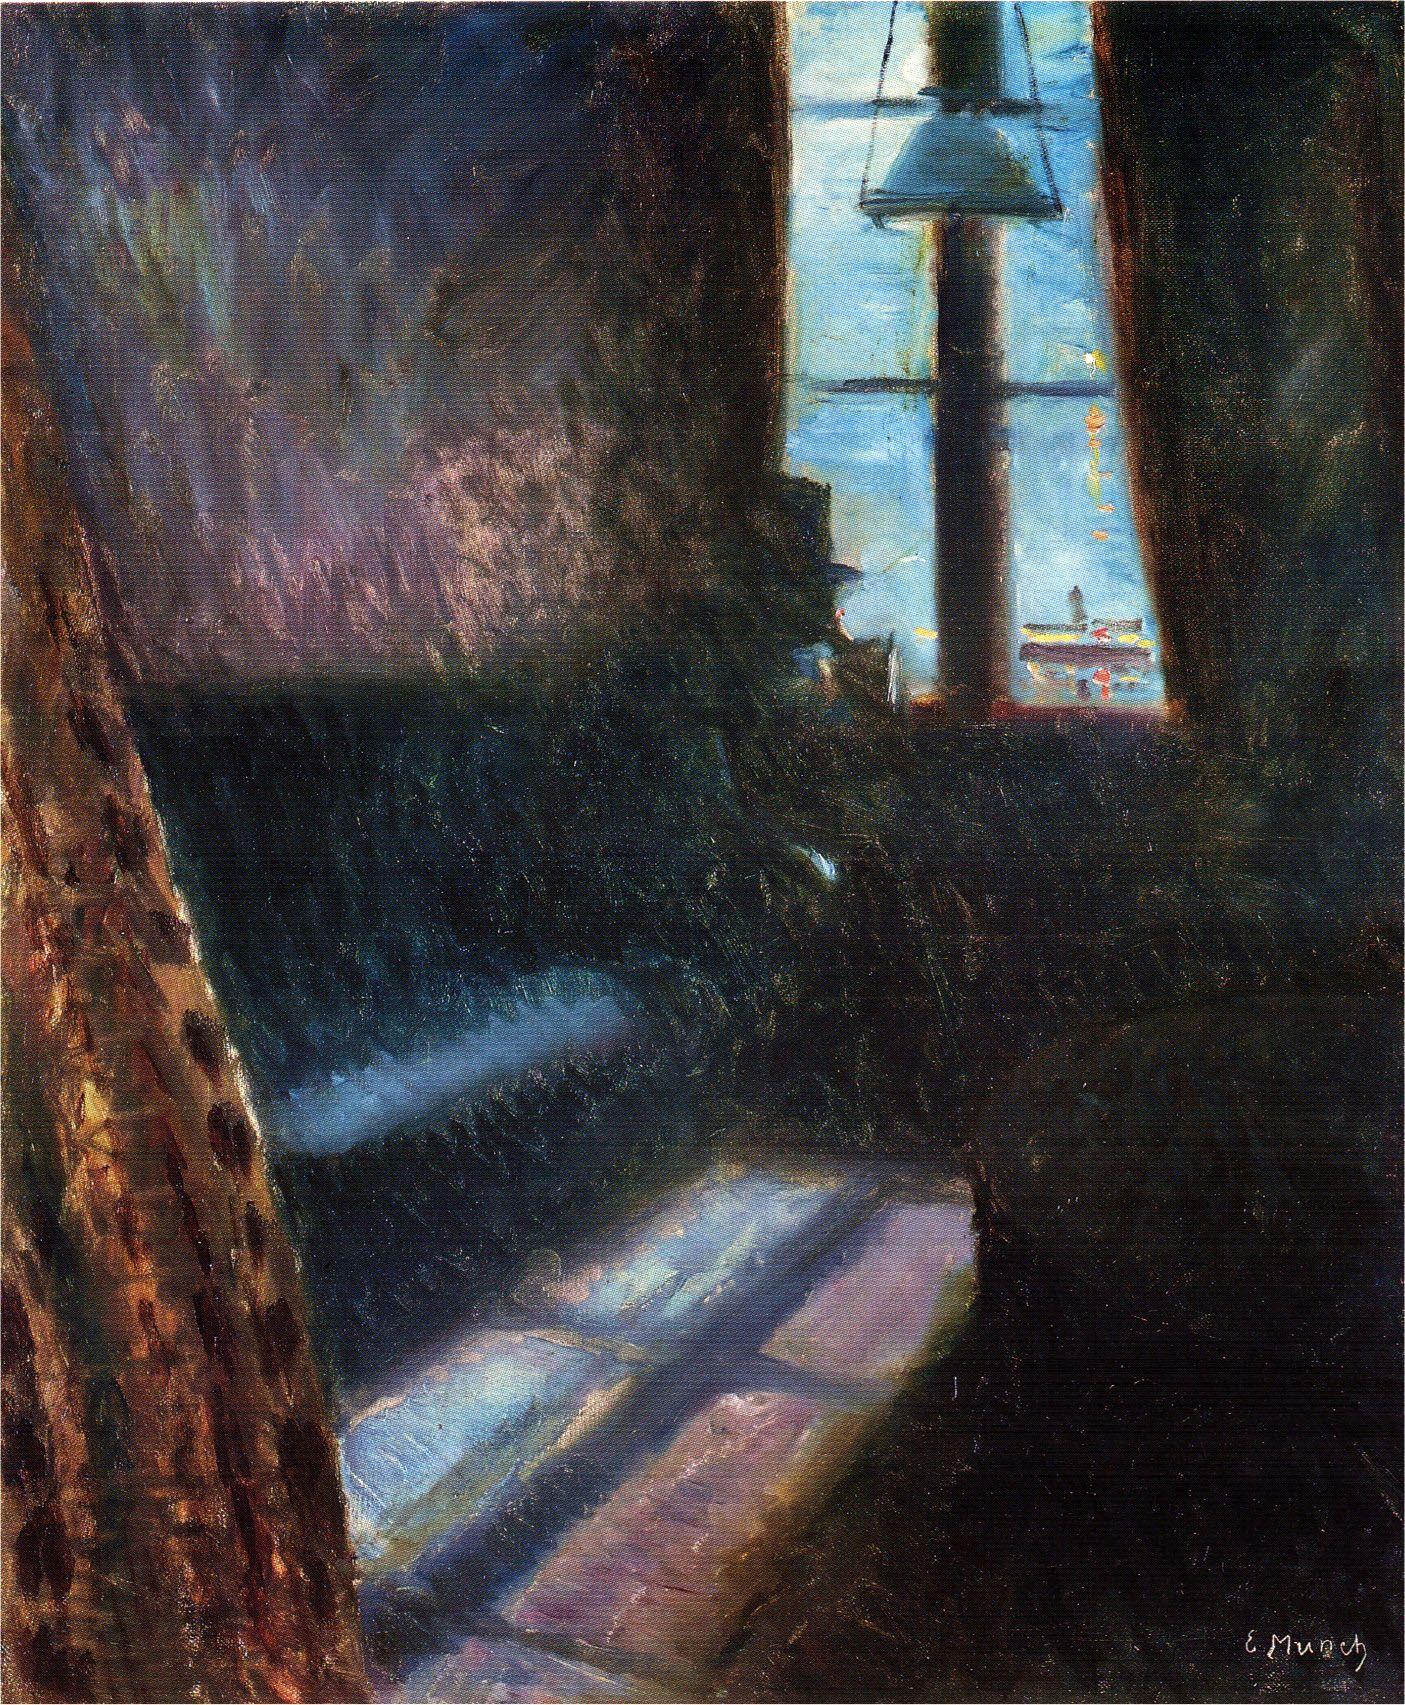 Edvard Munch - Night in St Cloud